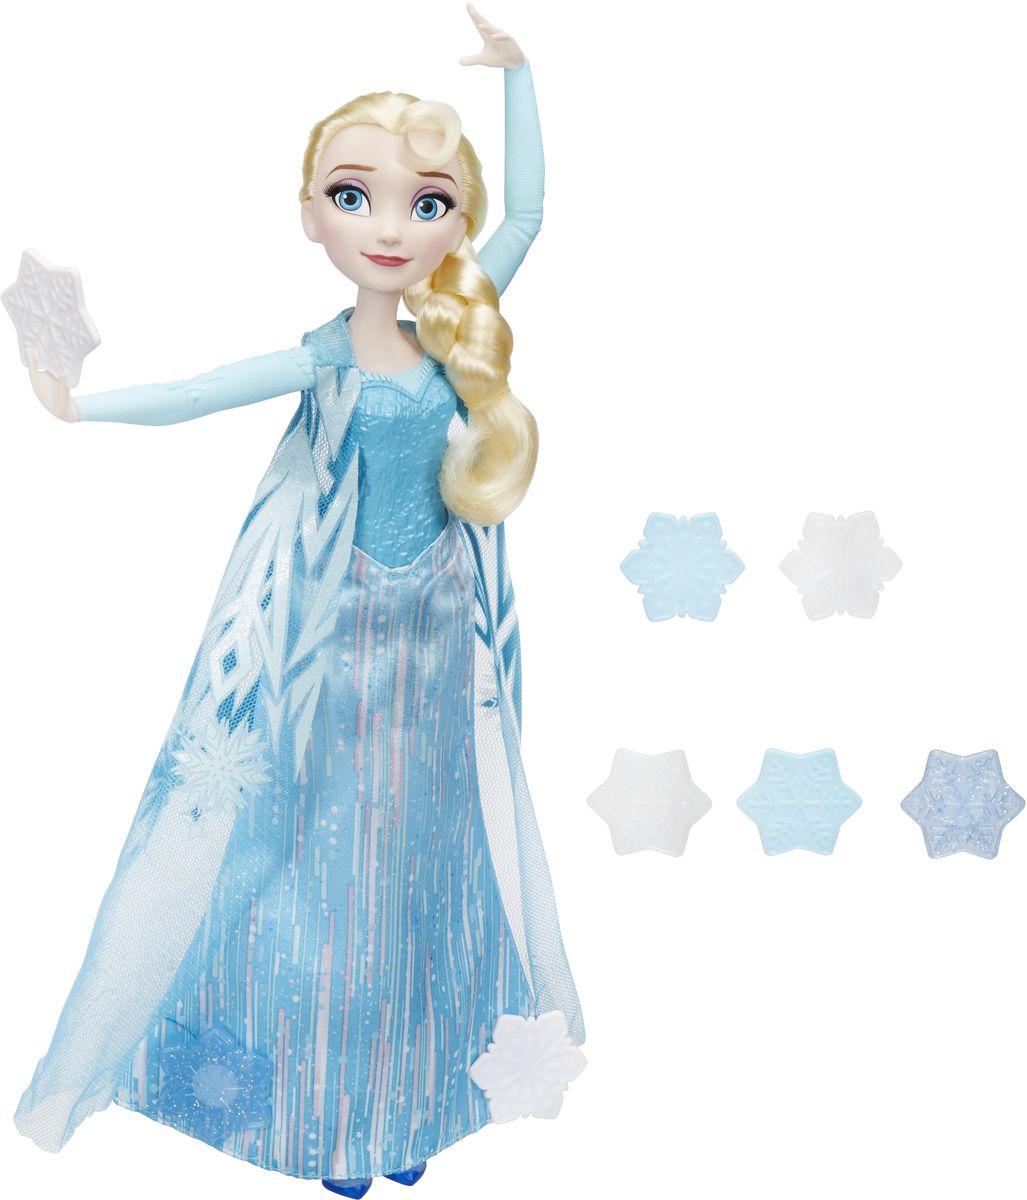 Disney Frozen Кукла Эльза запускающая снежинки рукой  disney frozen 8 pack marker set